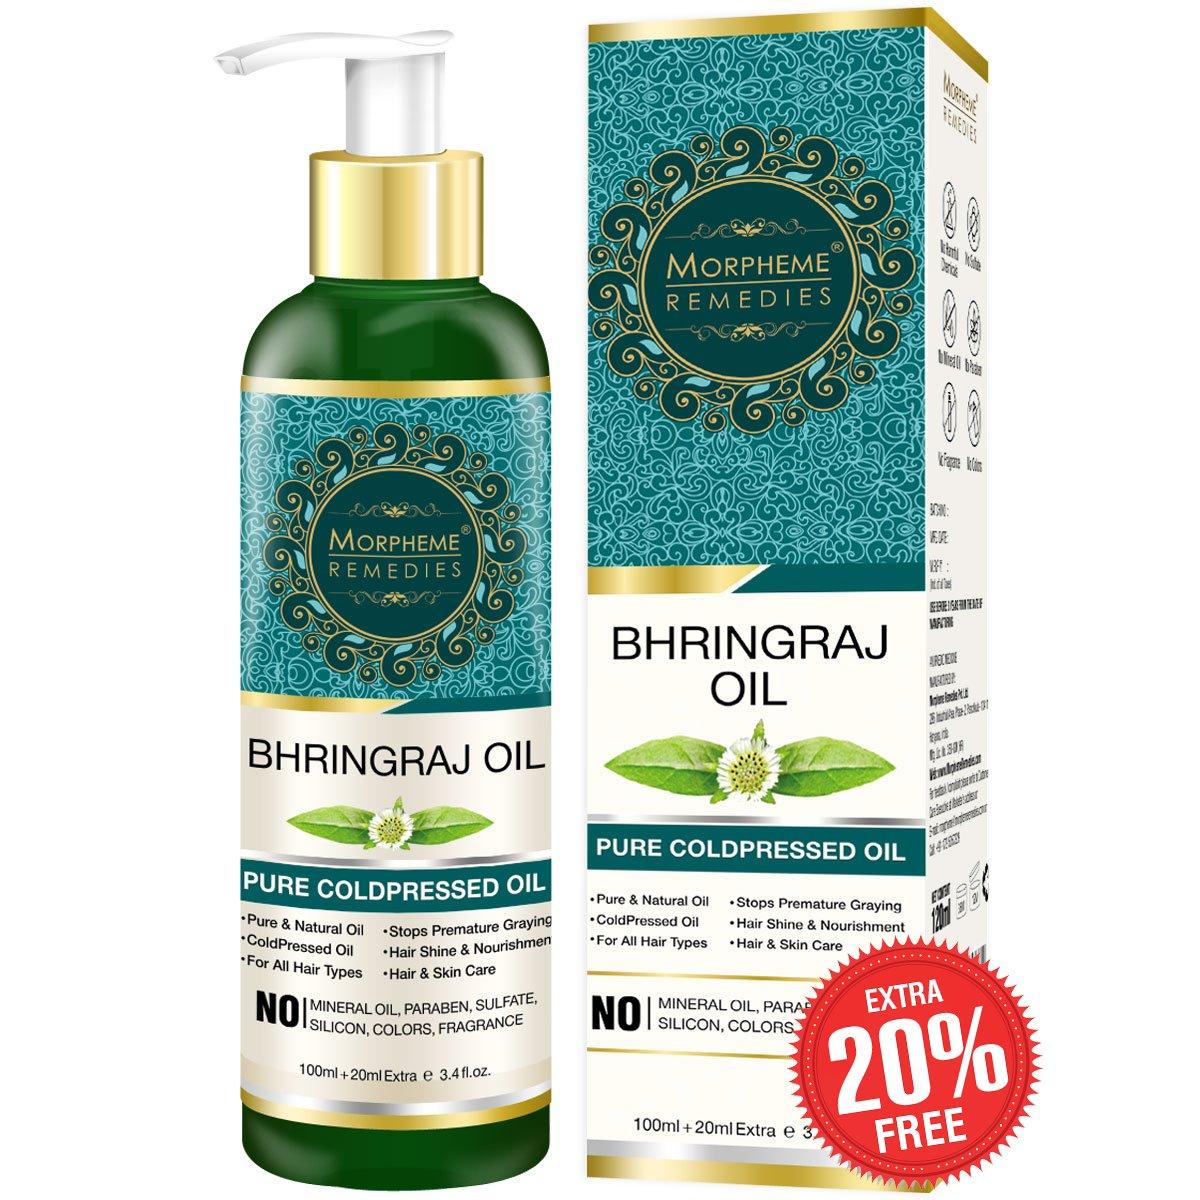 Morpheme Remedies Pure Bhringraj Oil (No Mineral Oil), 120ml product image